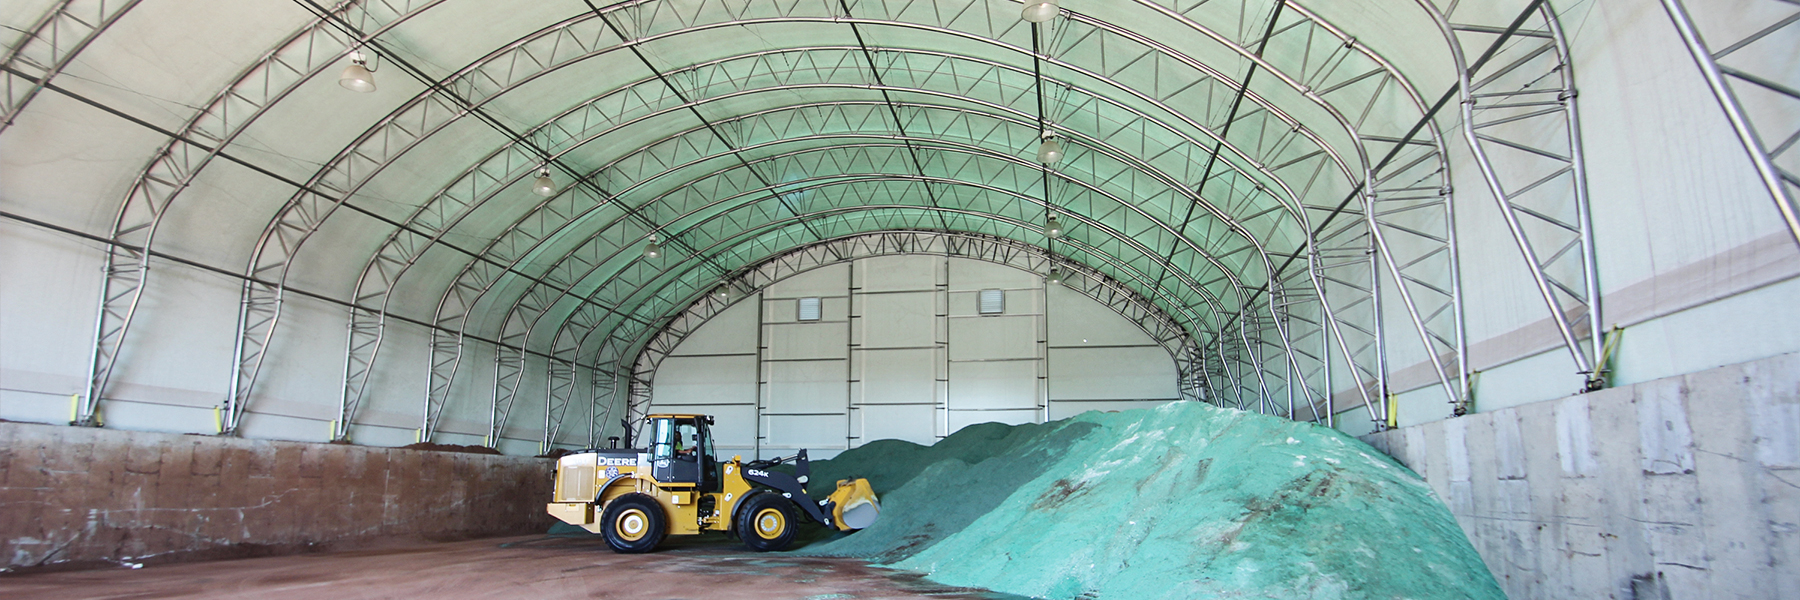 Sand and Salt Storage Building